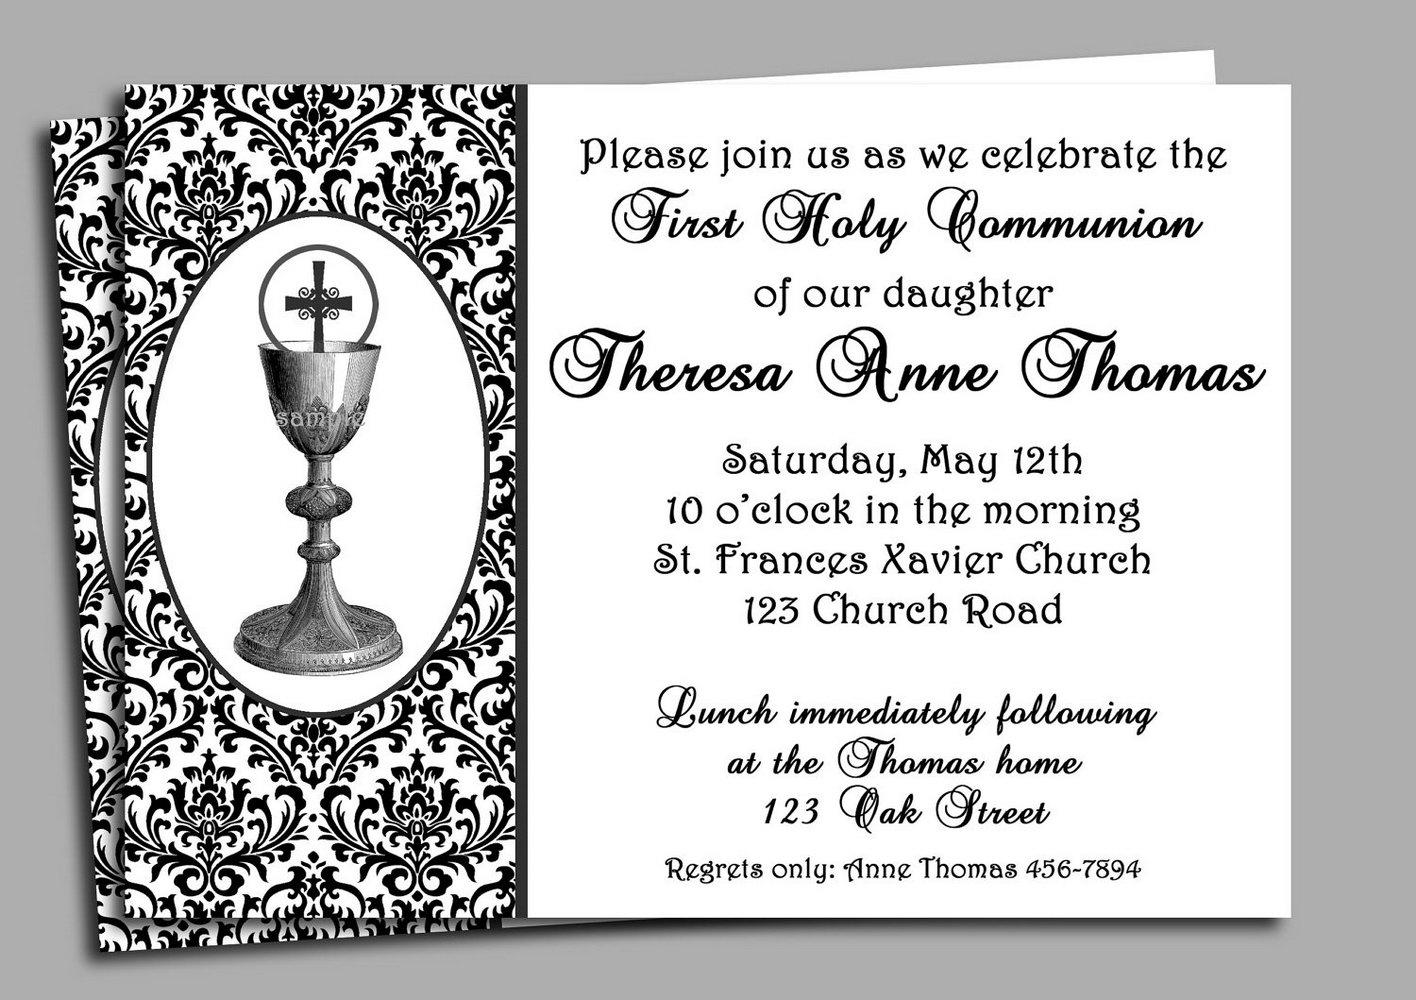 1st Communion Invitation Templates Free